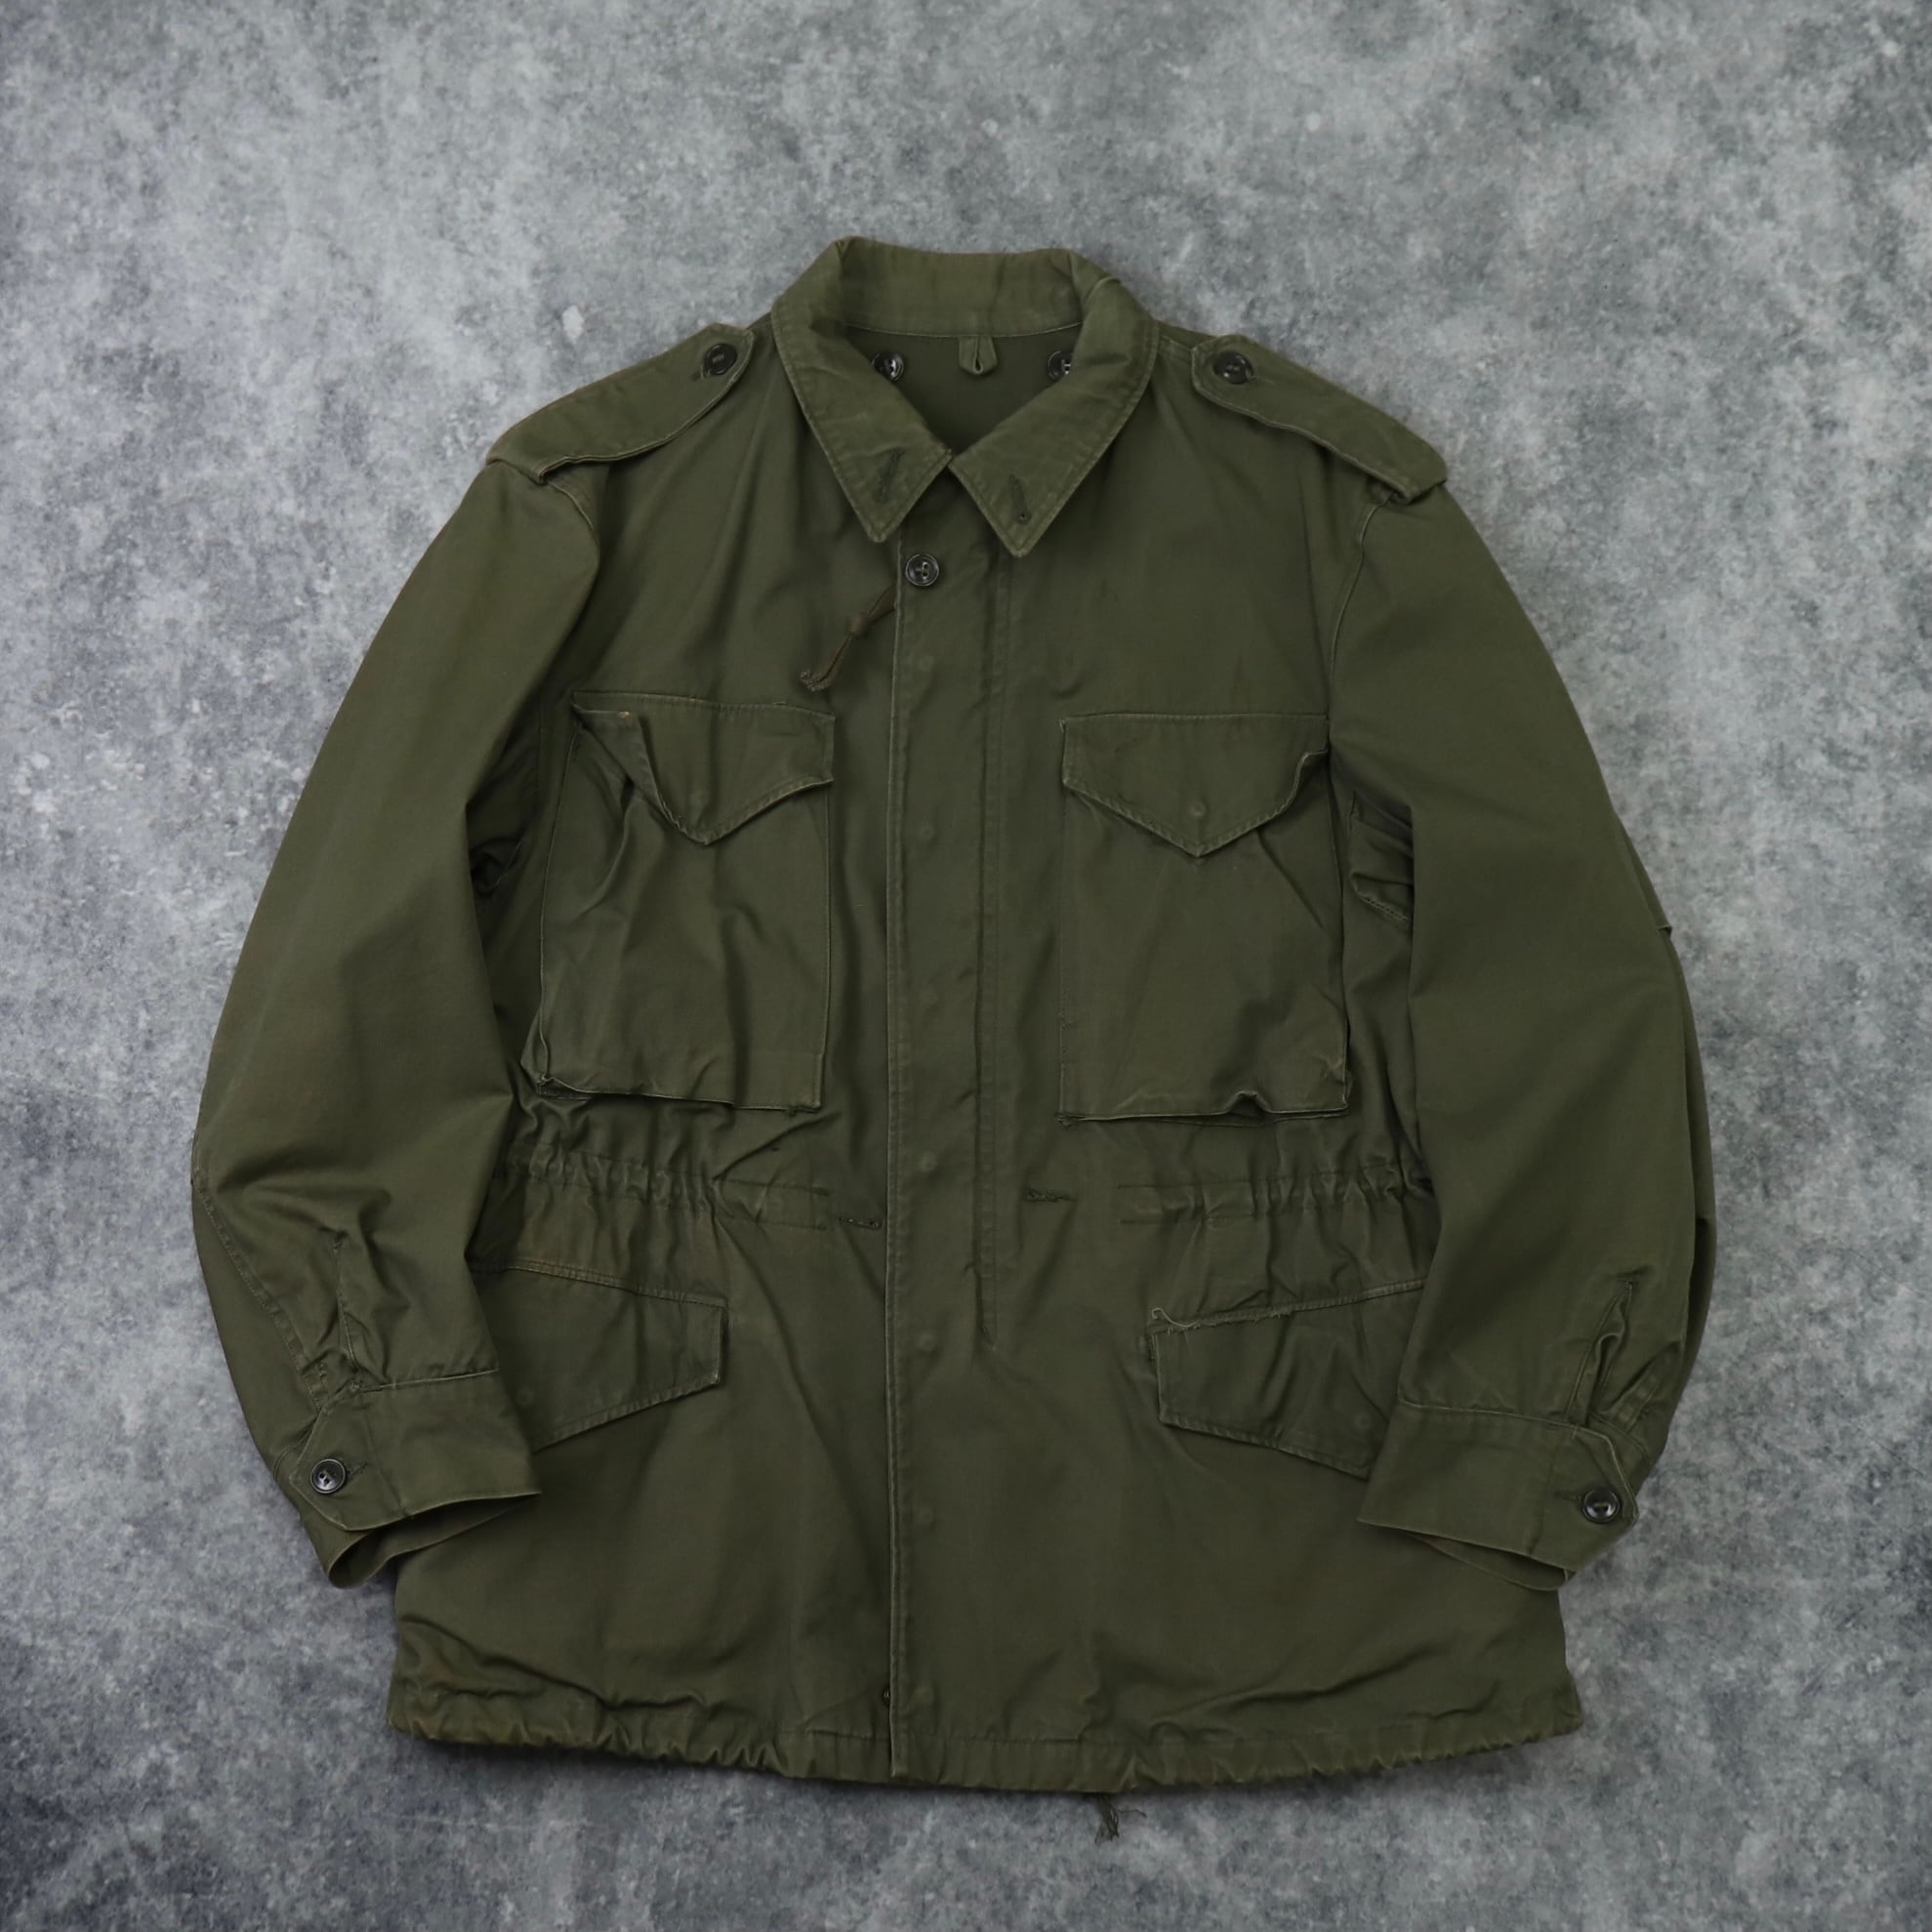 50's  M-51  Field  Jacket   M-R   50年代   m51  フィールドジャケット   ミディアムレギュラー 古着 ミリタリー A571